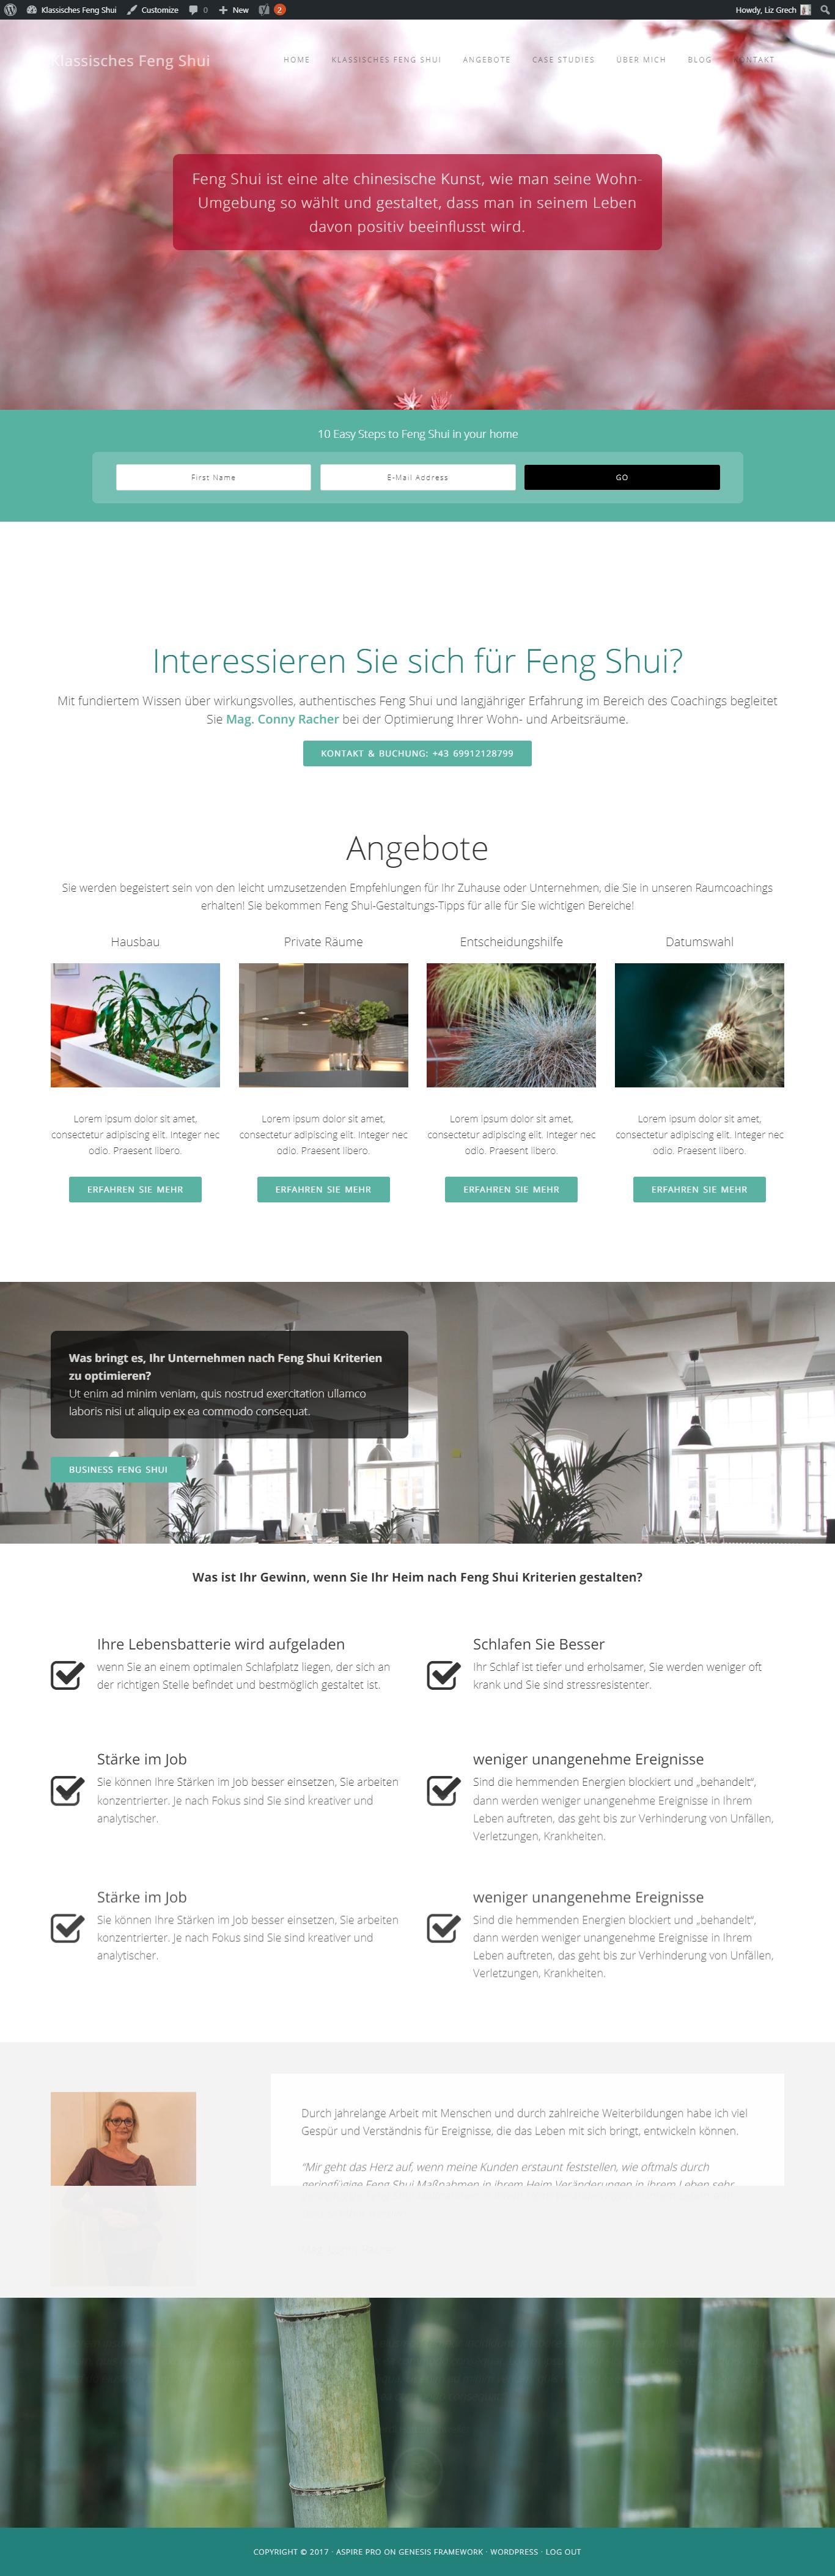 aspire theme issues strategic wordpress websites seo. Black Bedroom Furniture Sets. Home Design Ideas